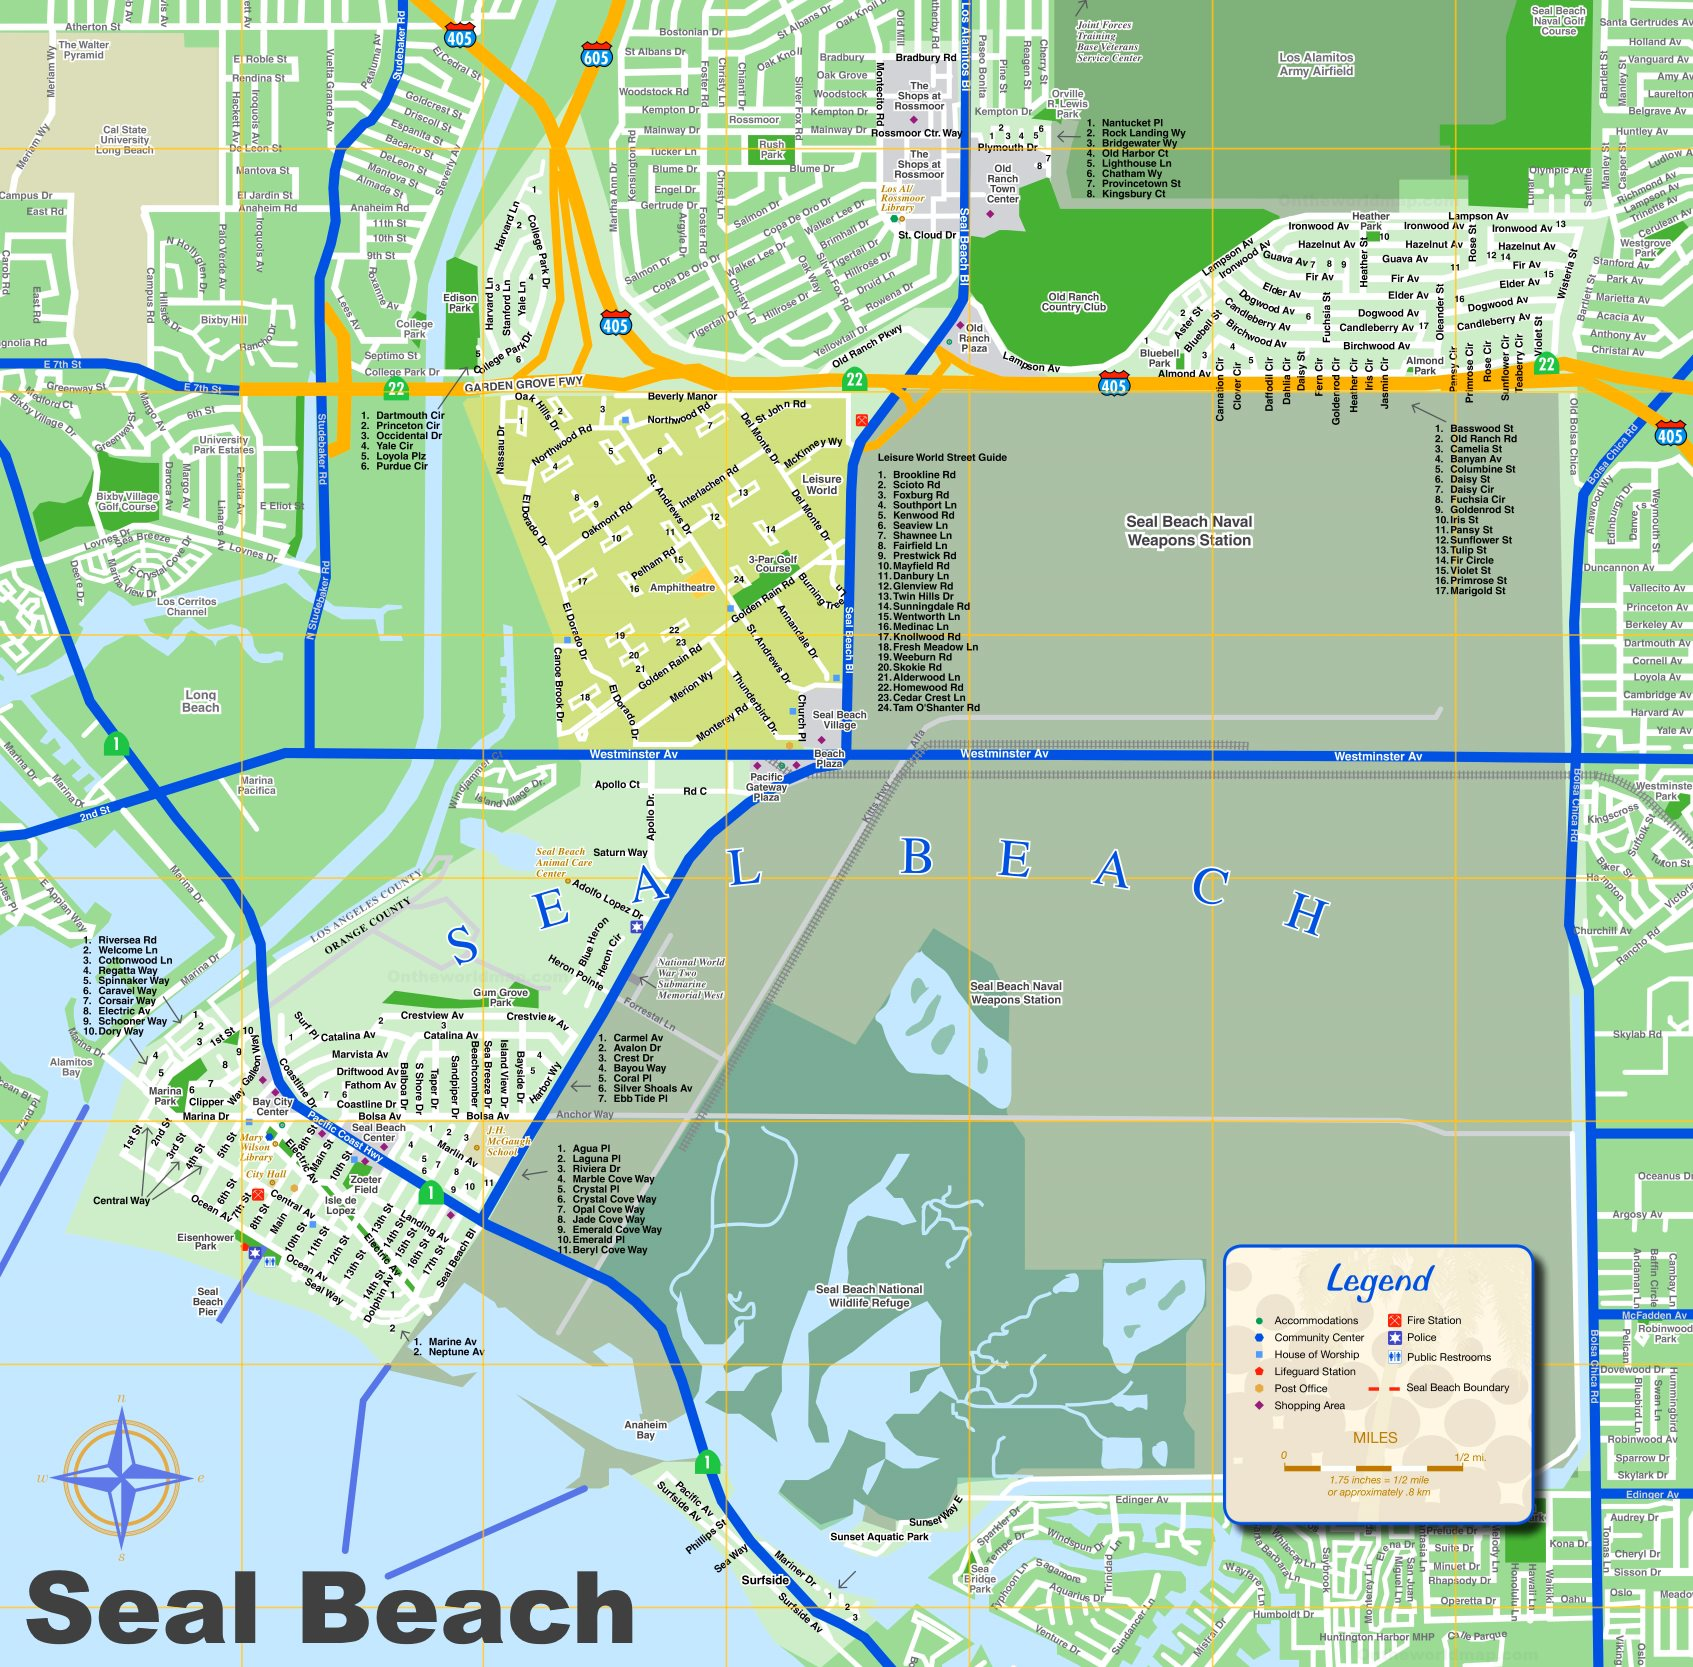 seal beach tourist map